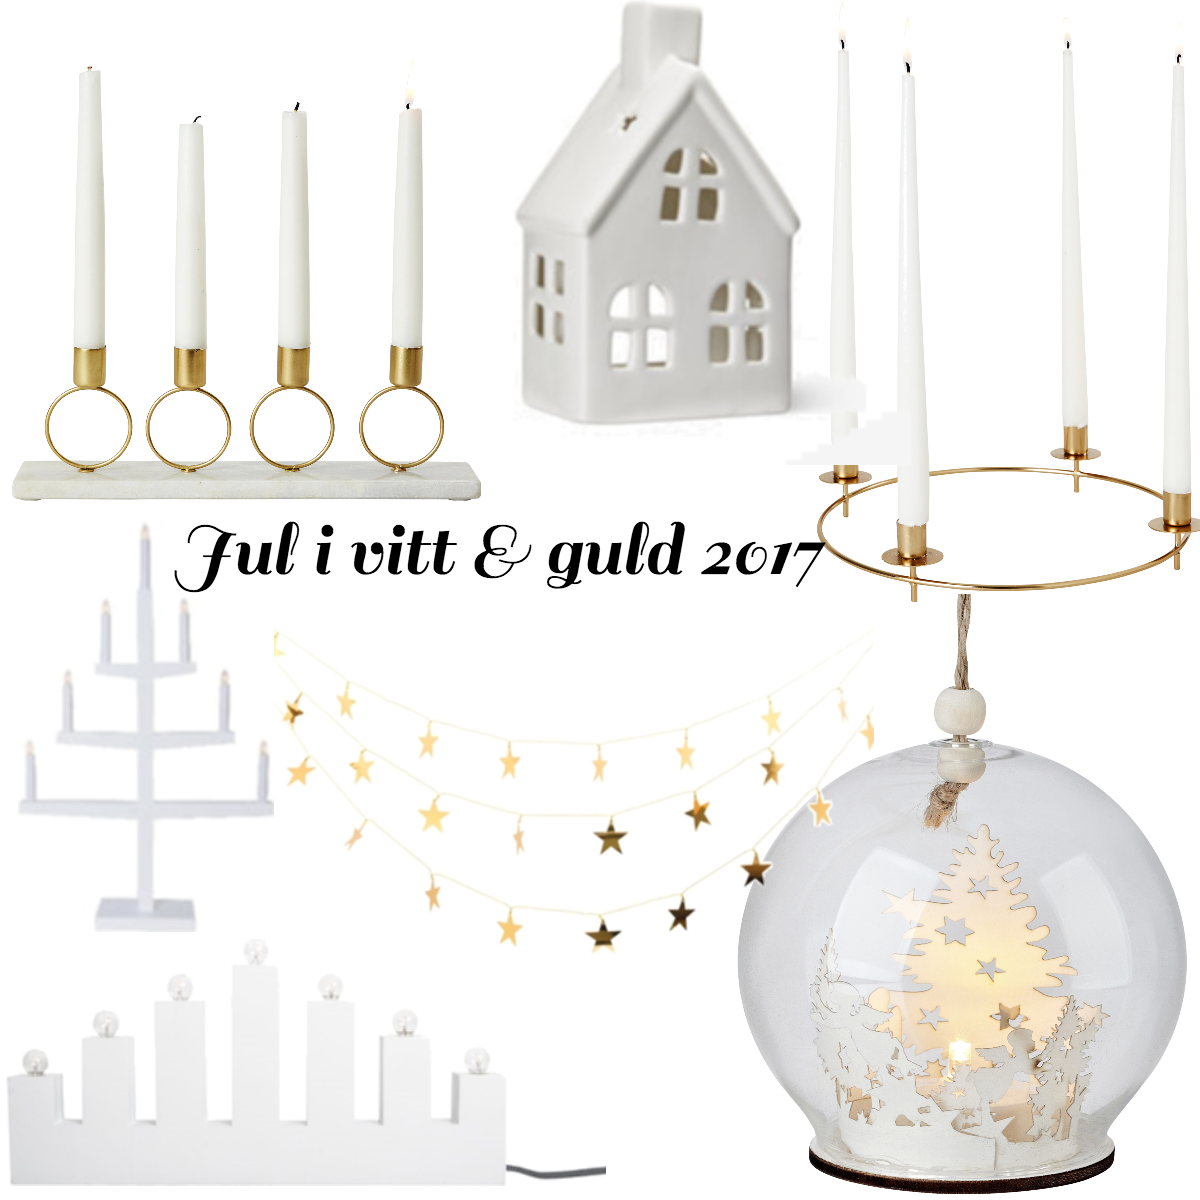 Jul i vitt & guld 2017